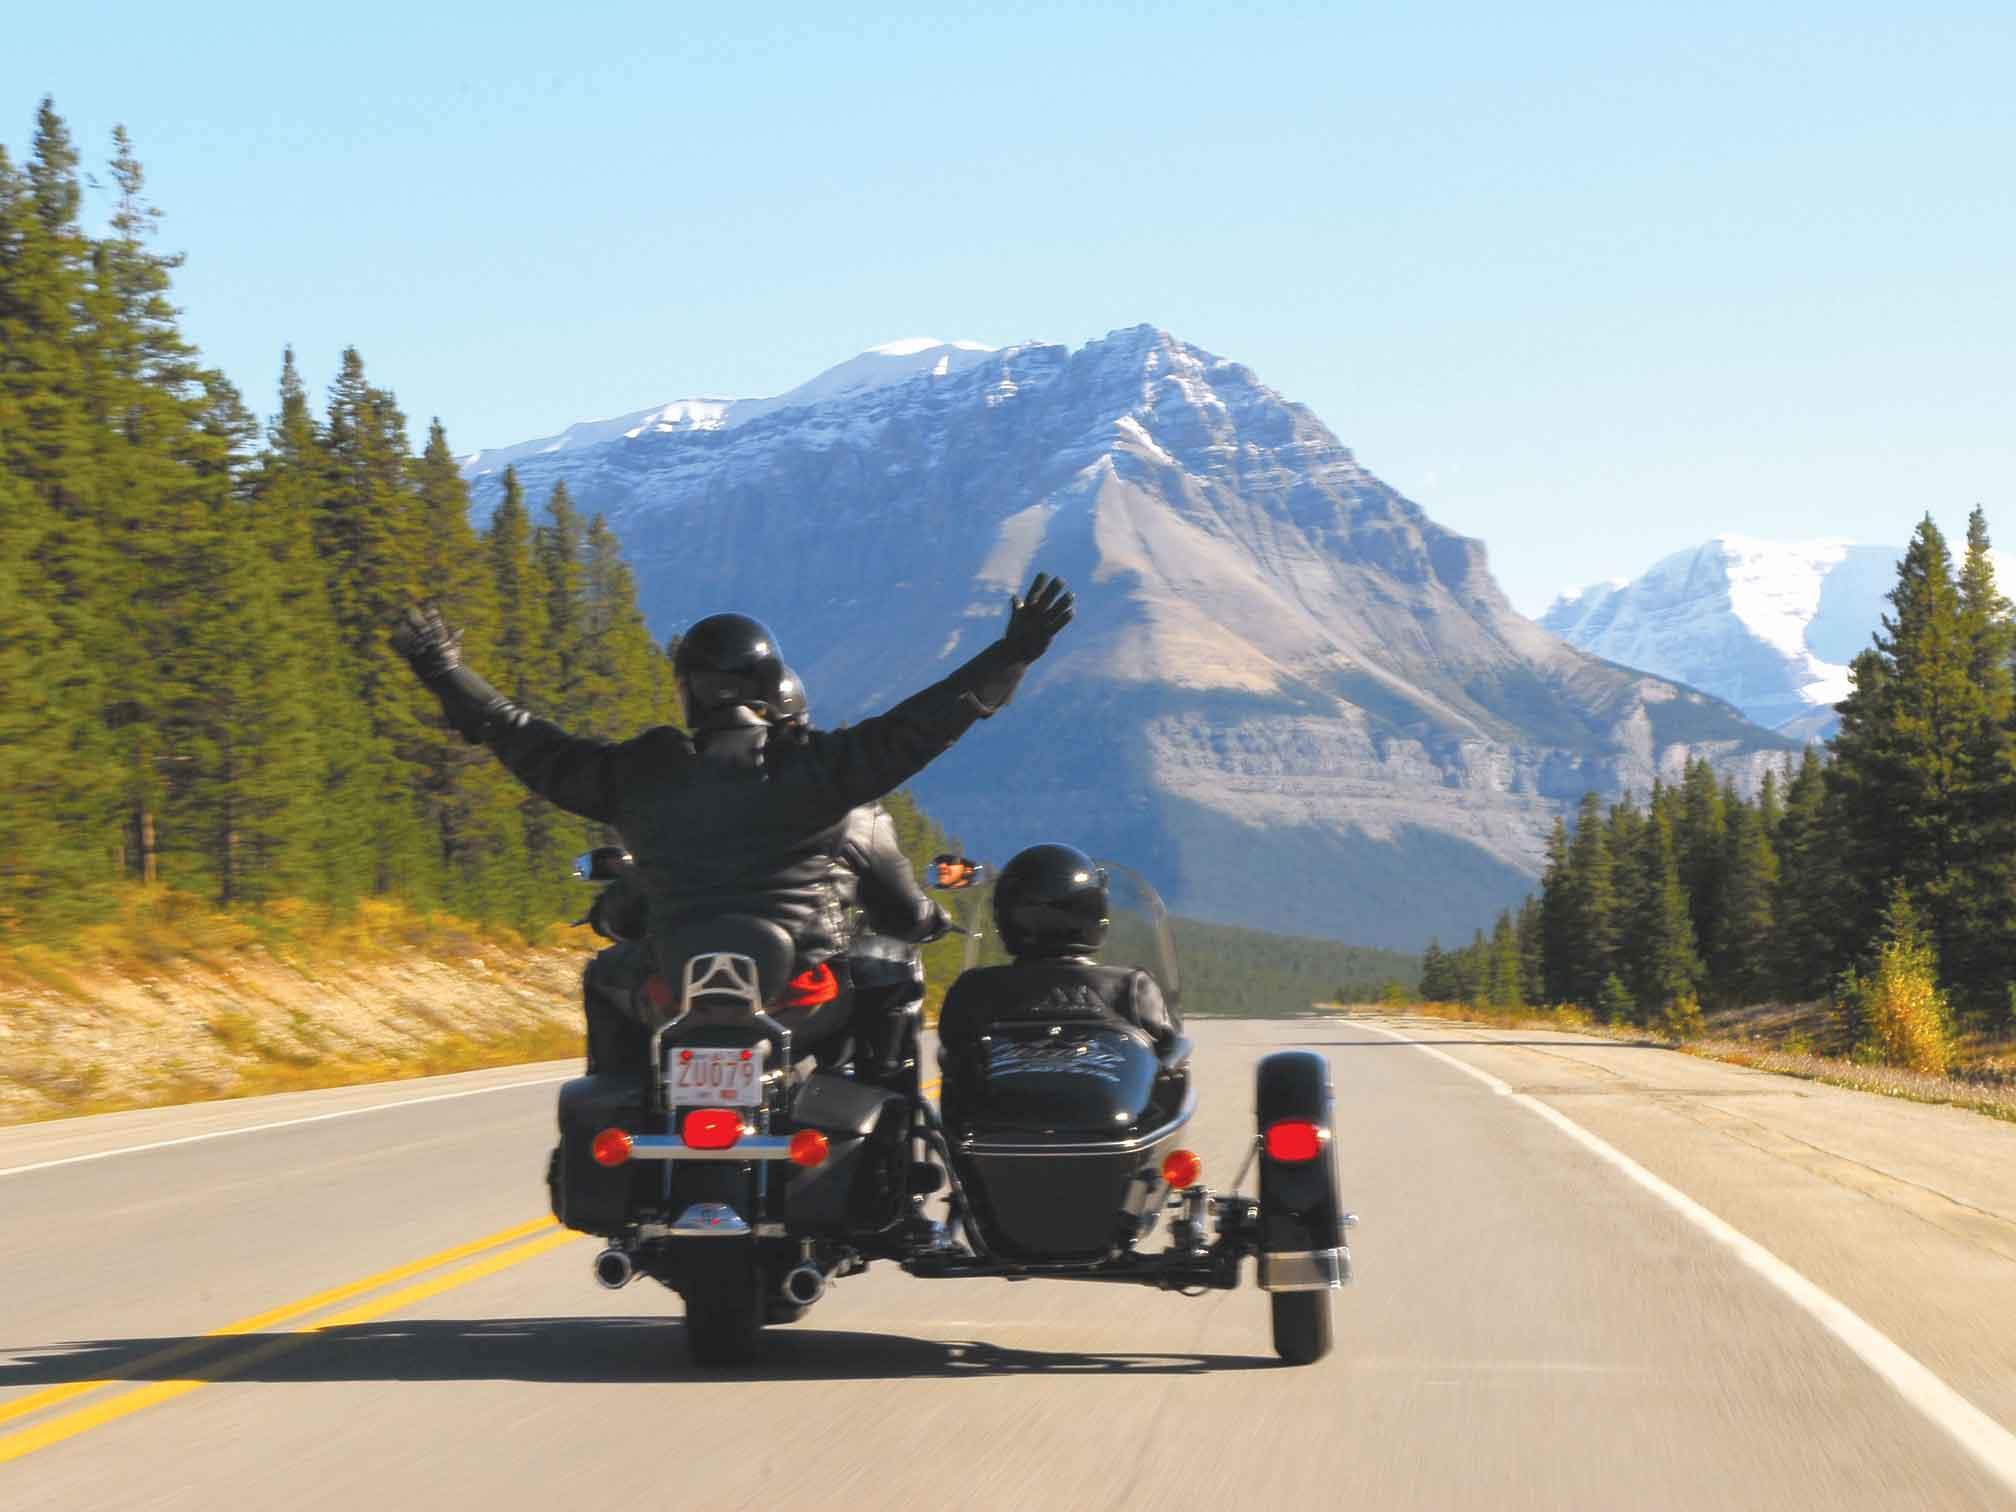 Jasper Summer Adventures: Motorcycle Tour